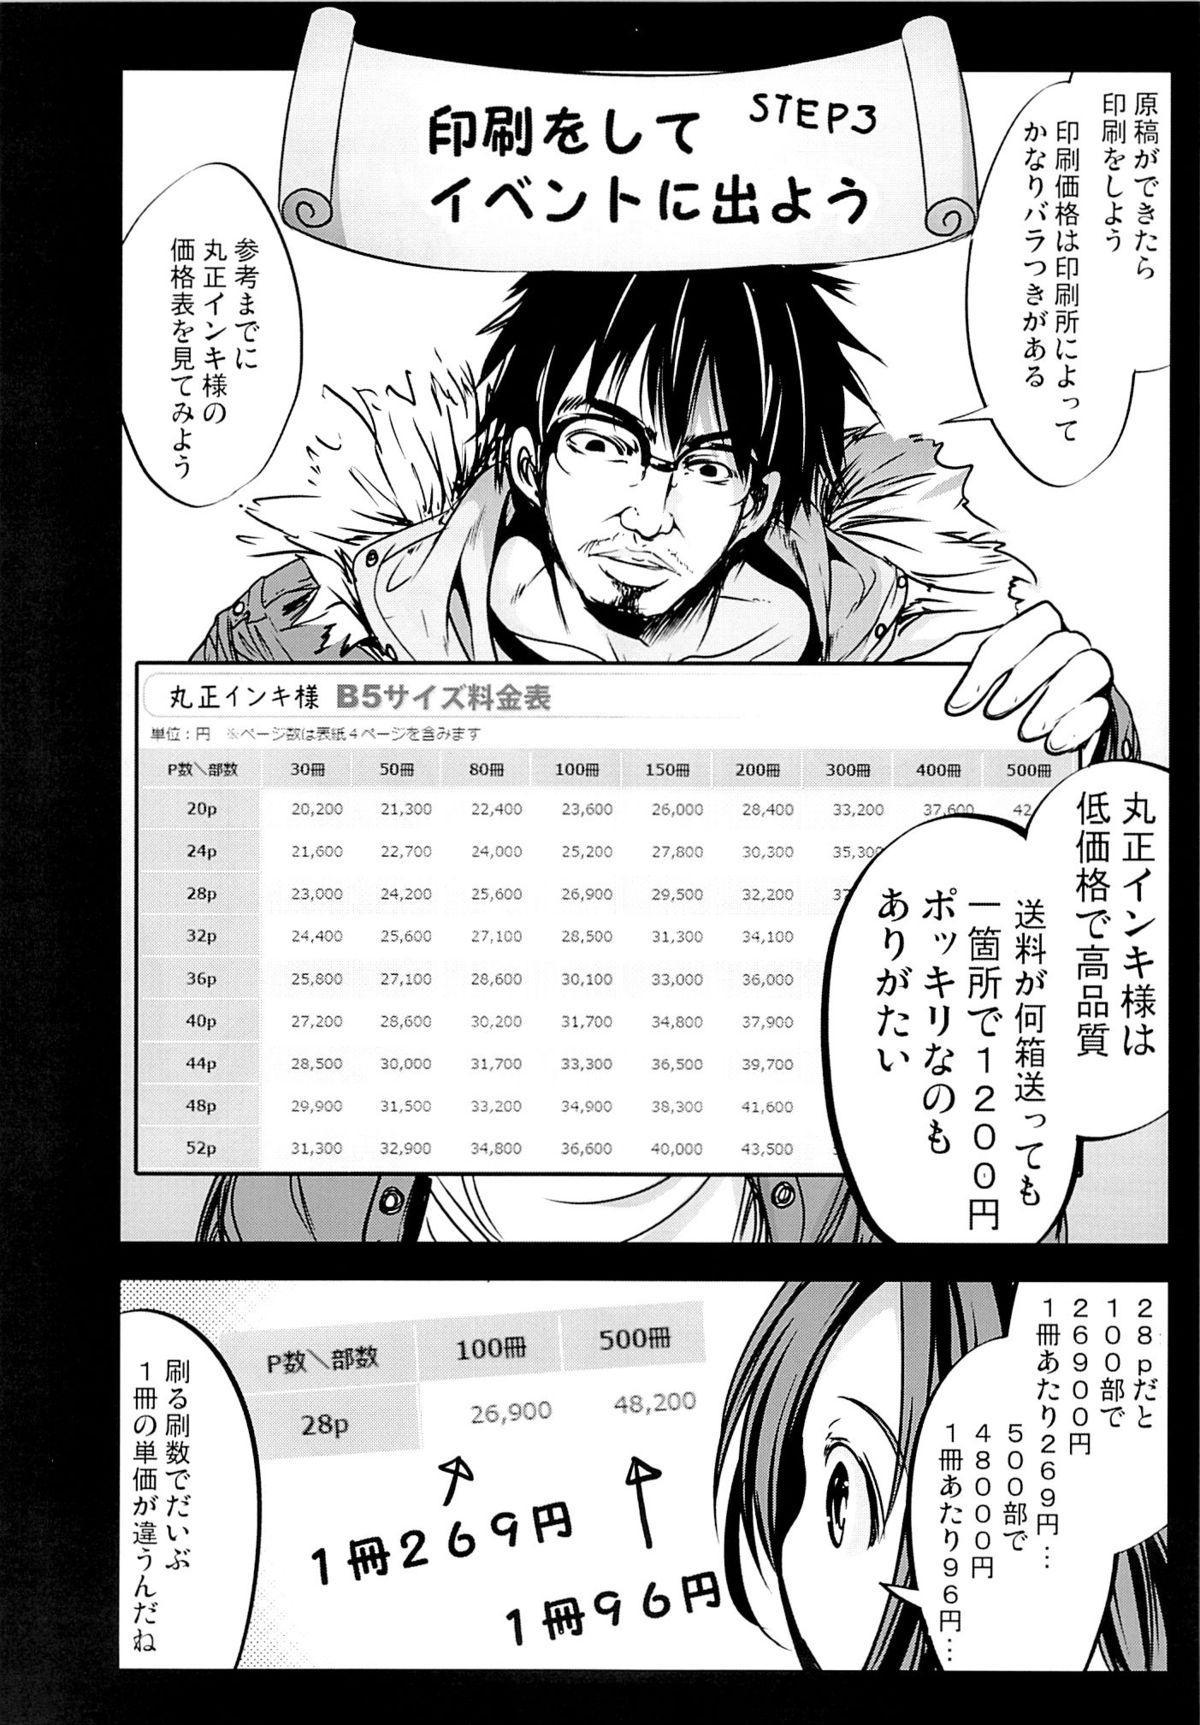 H na Doujinshi no Kakikata 24